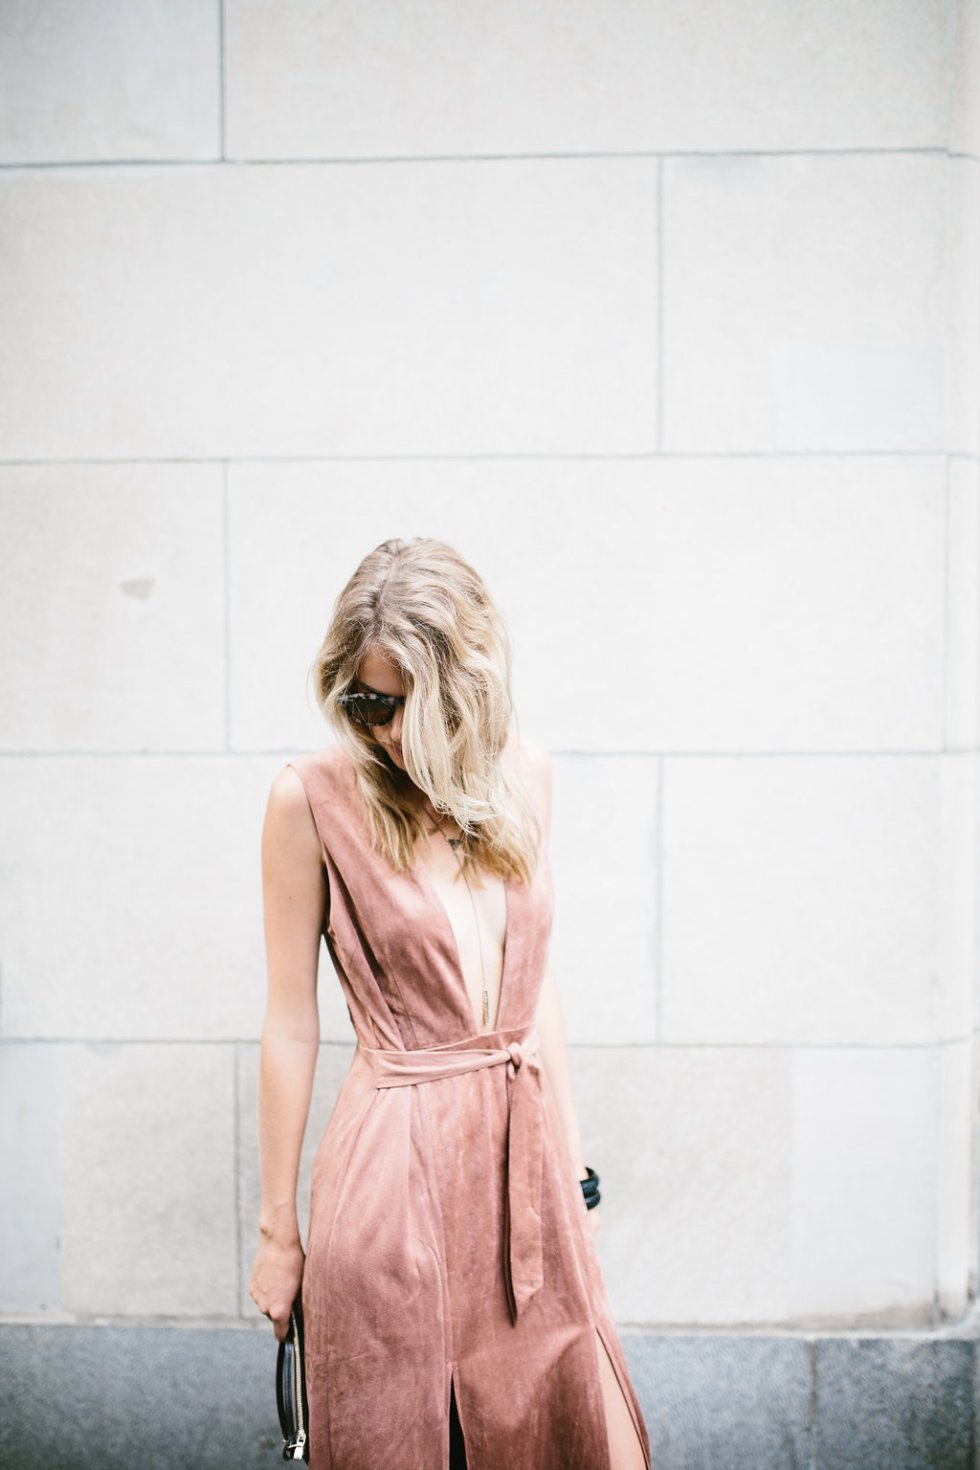 Hommage Suede Dress on PAULARALLIS.com